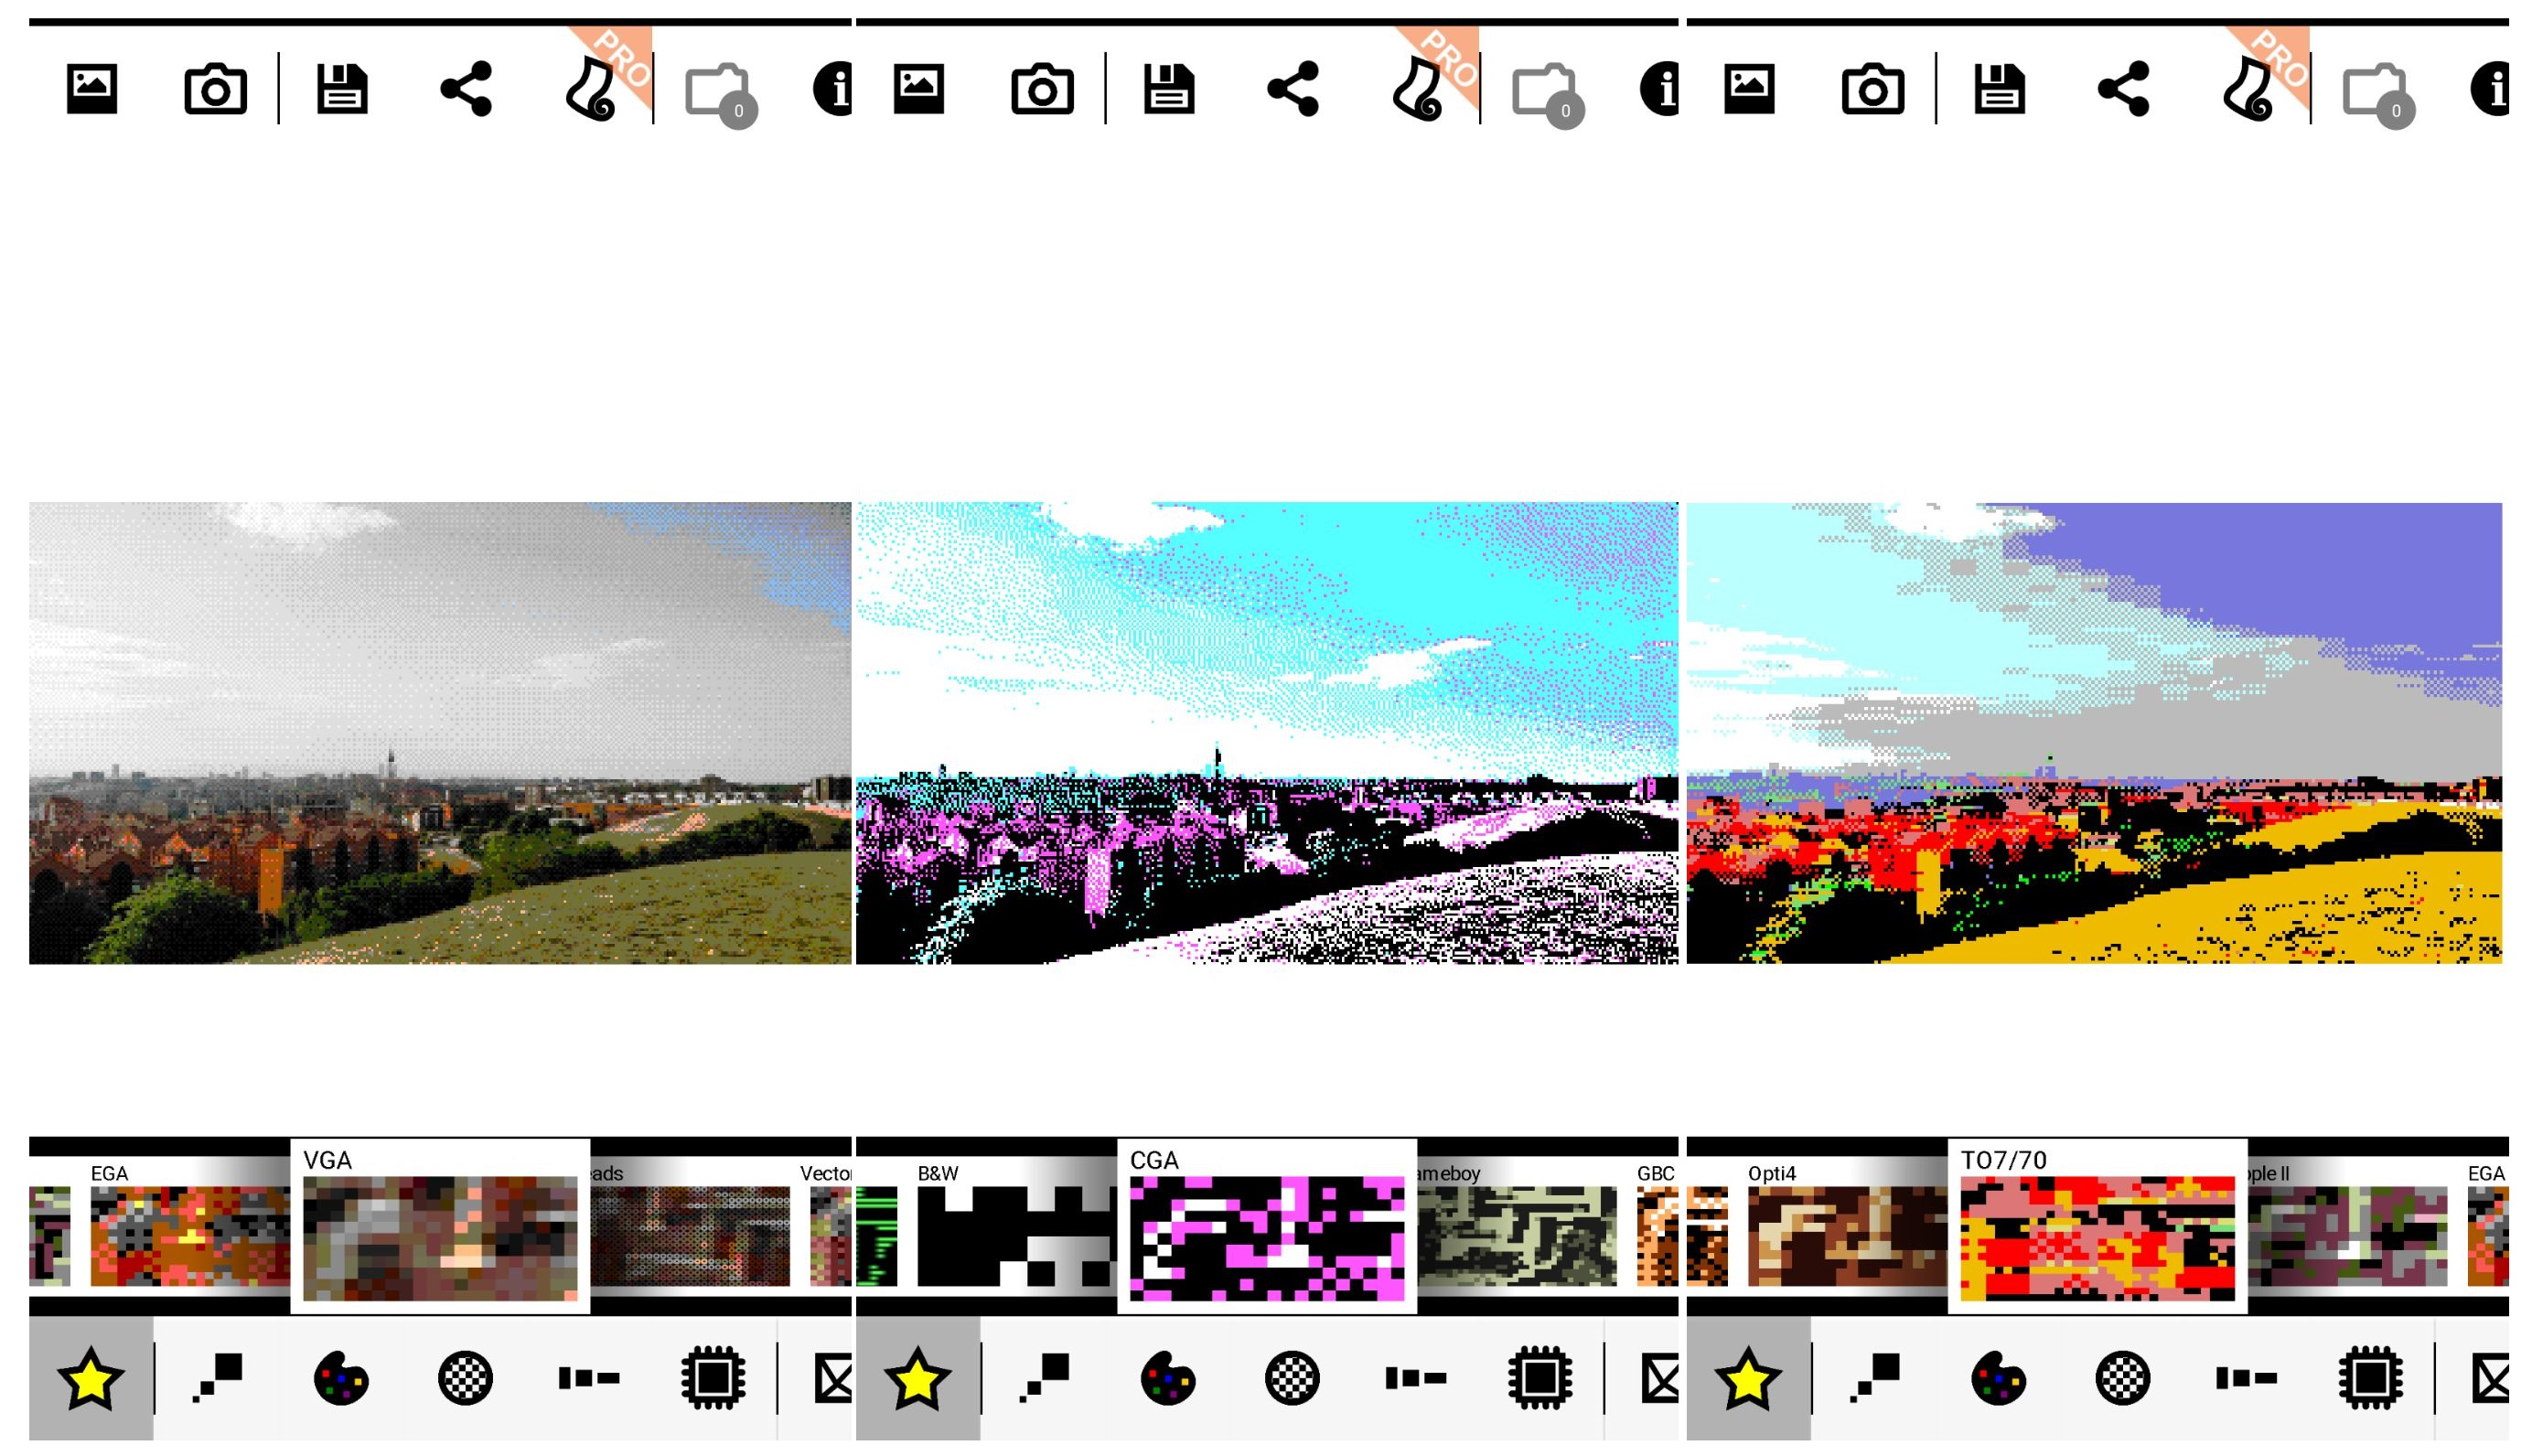 imágenes en 8 bits